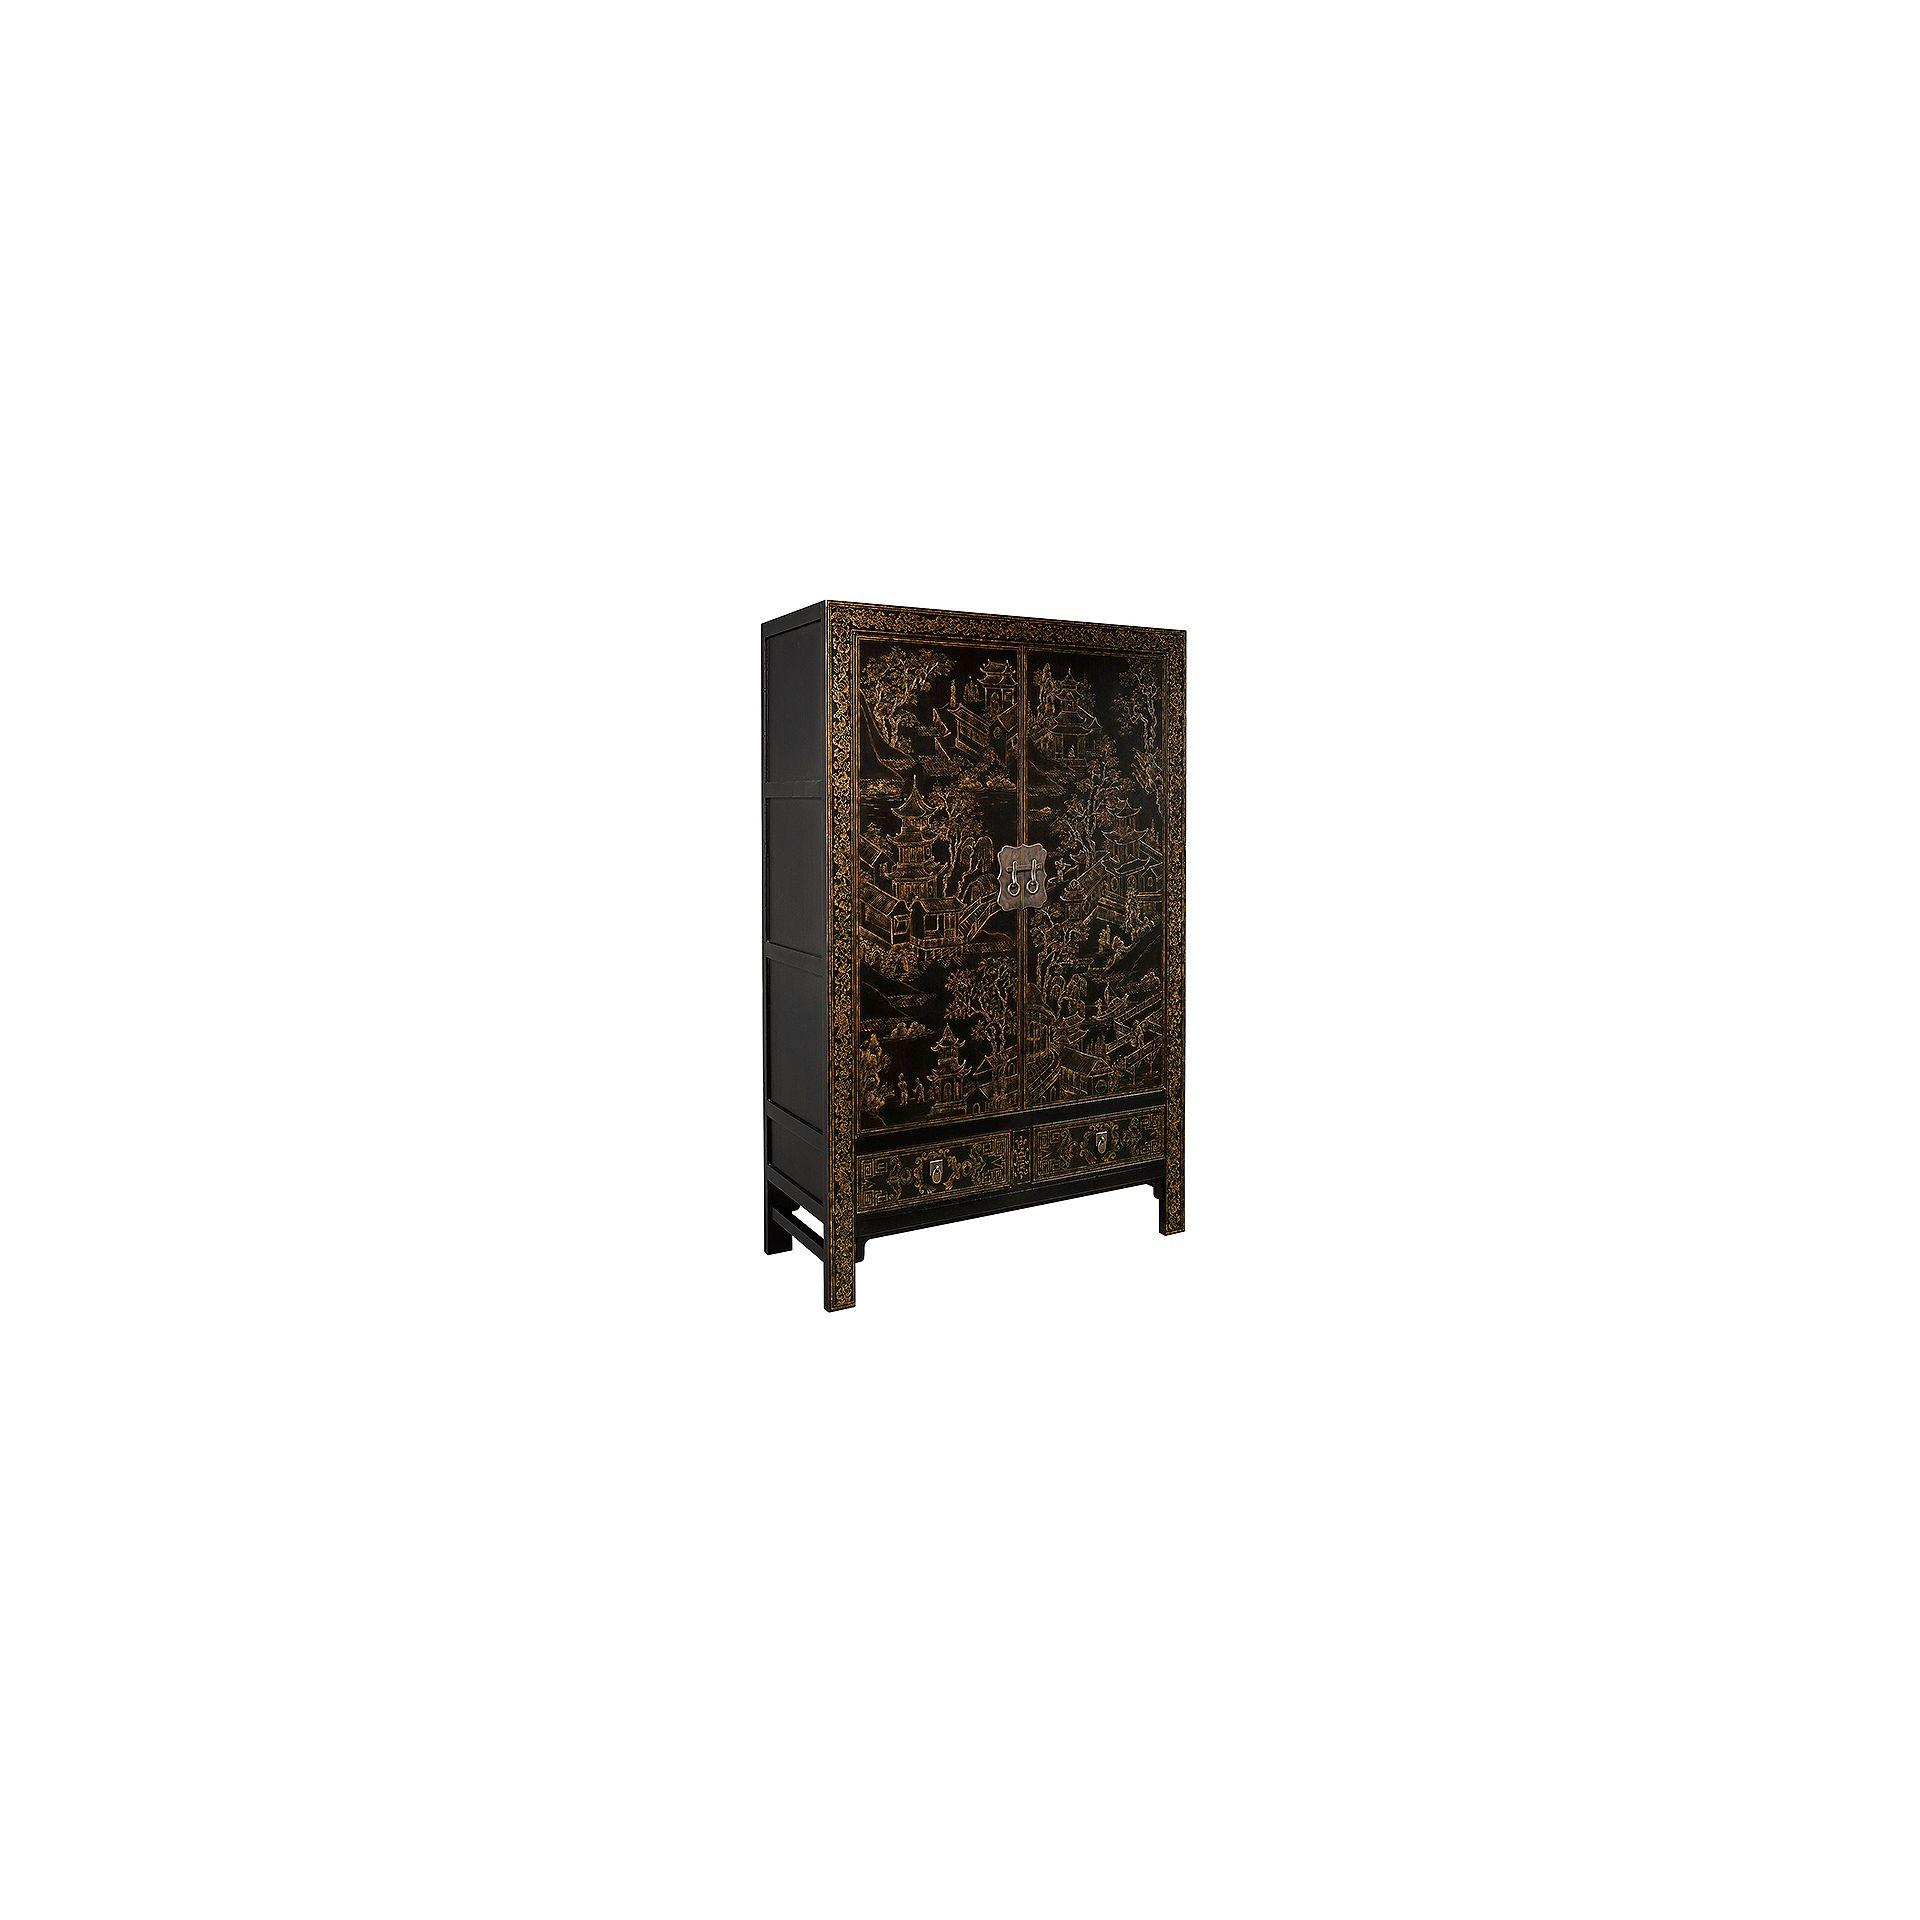 henredon-furniture-2401-05-816 Incroyable De Armoire De Jardin Ikea Des Idées